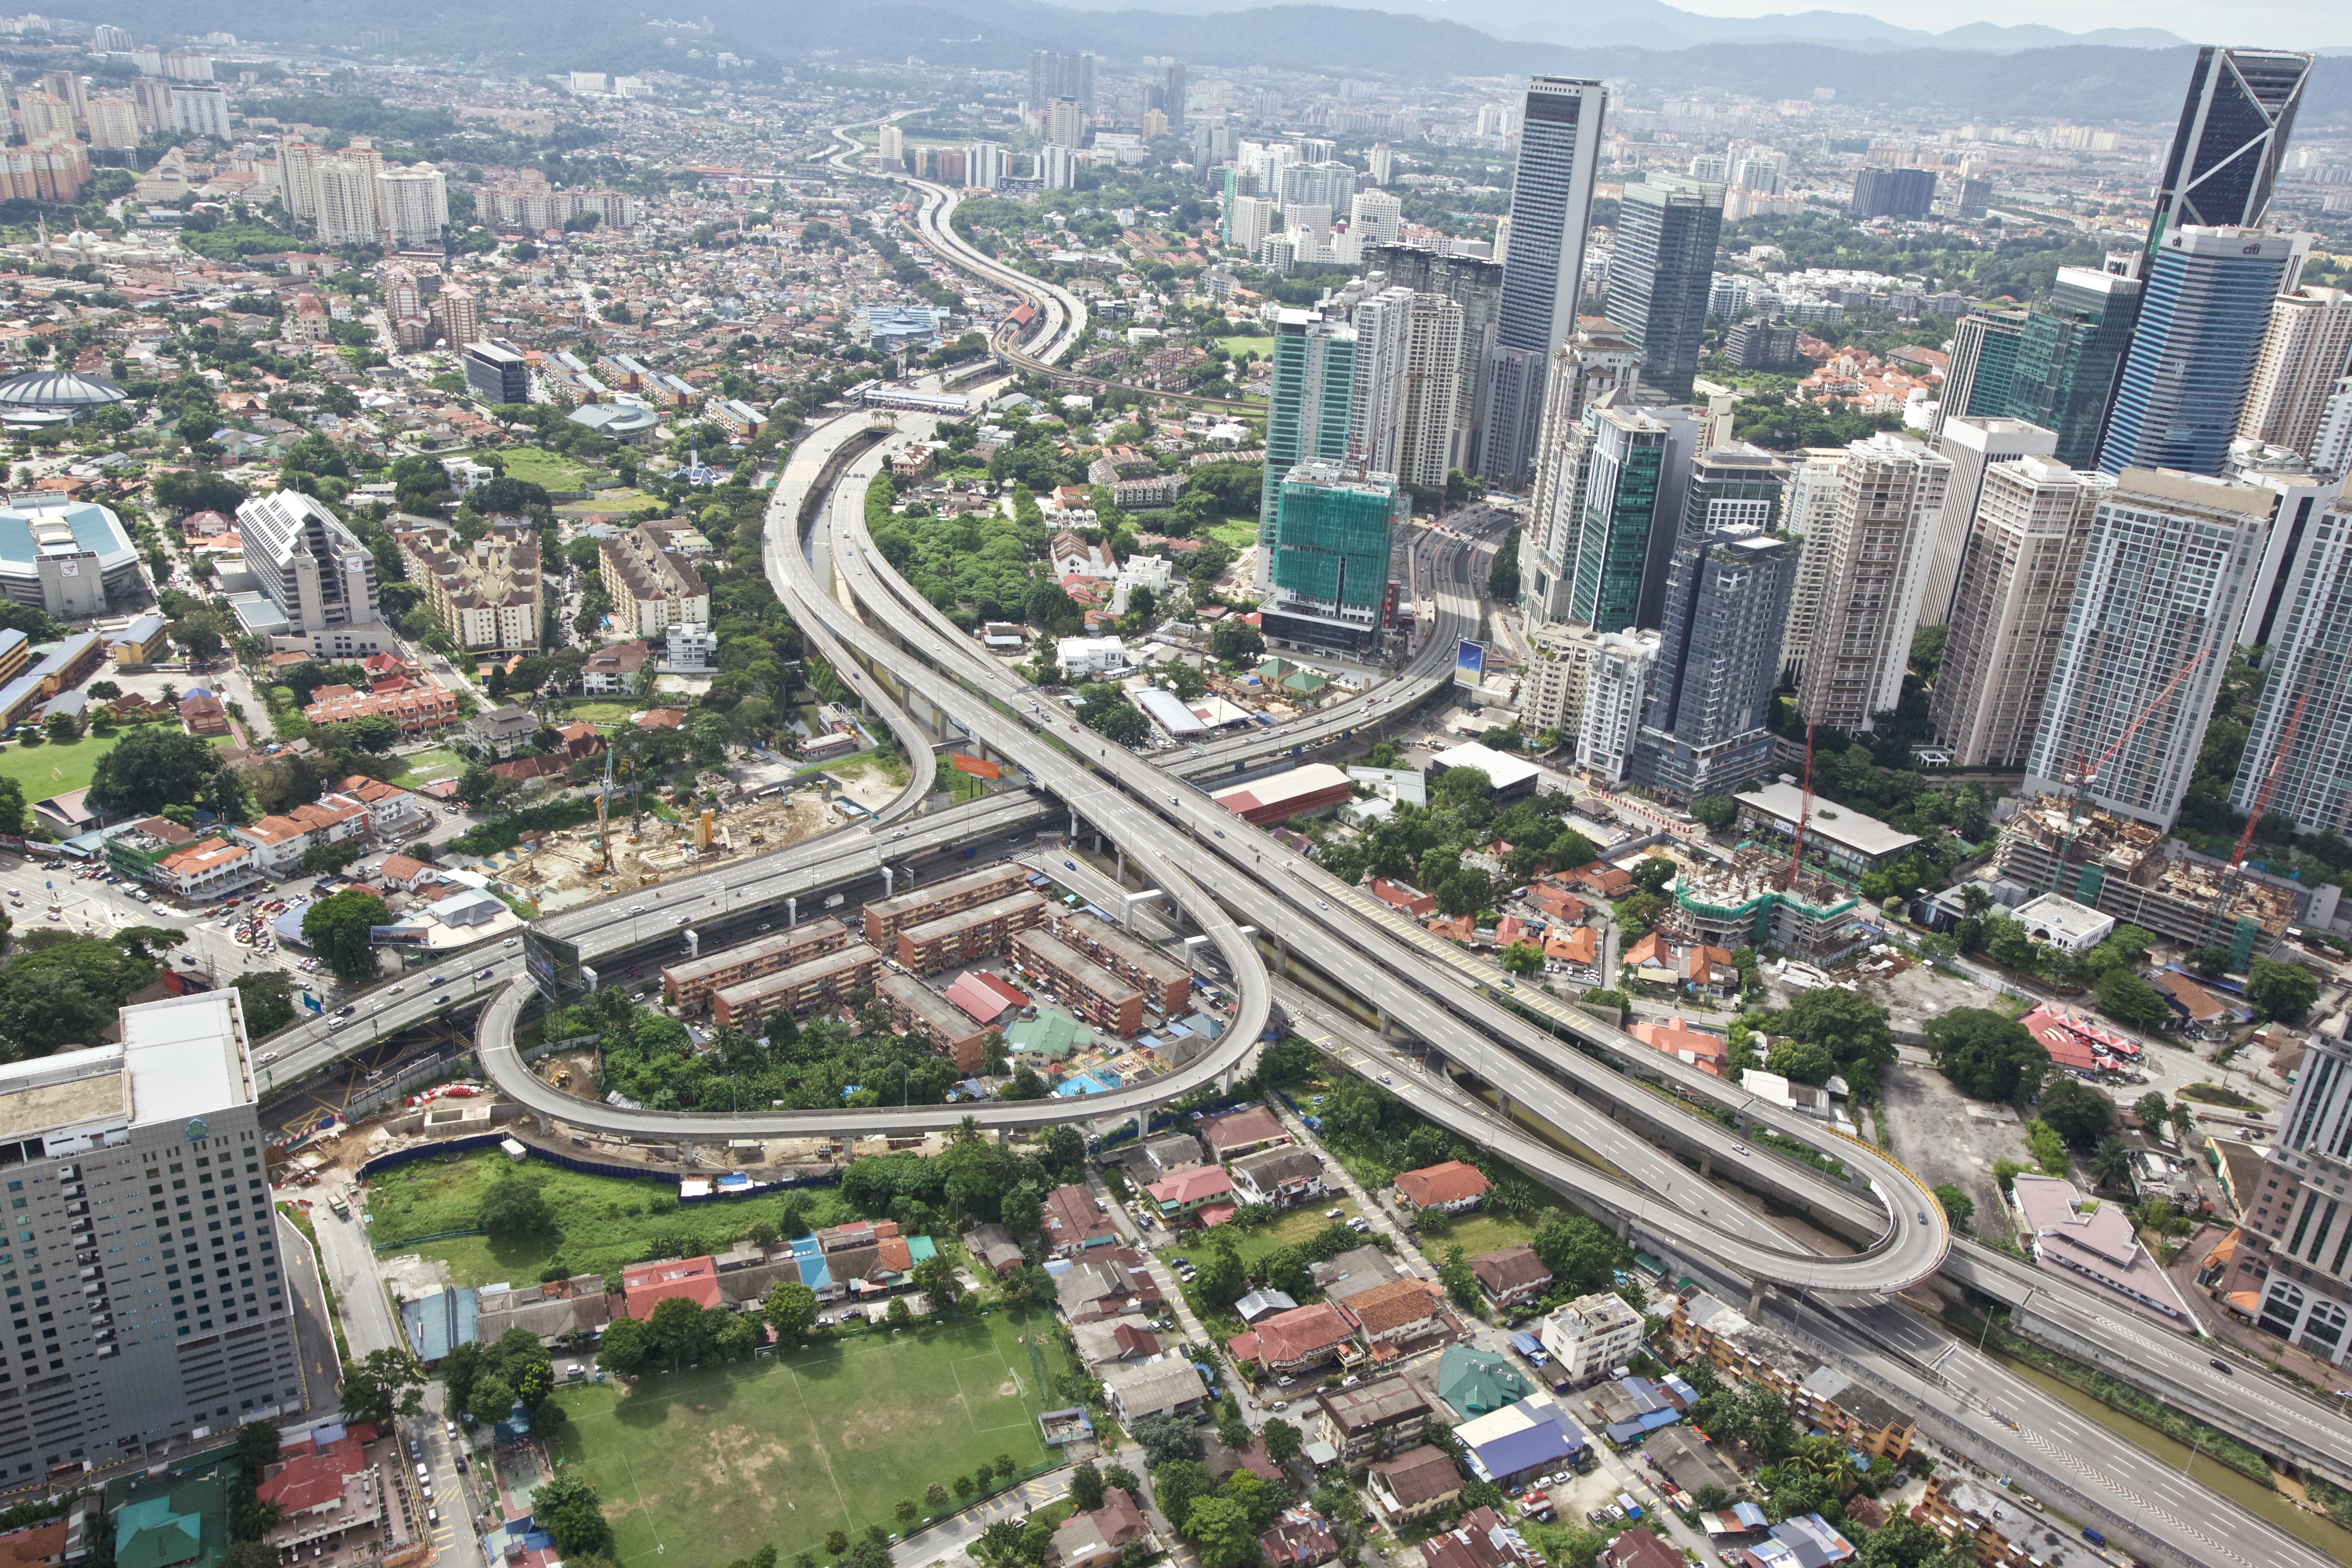 Ampang-Kuala Lumpur Elevated Highway (AKLEH)